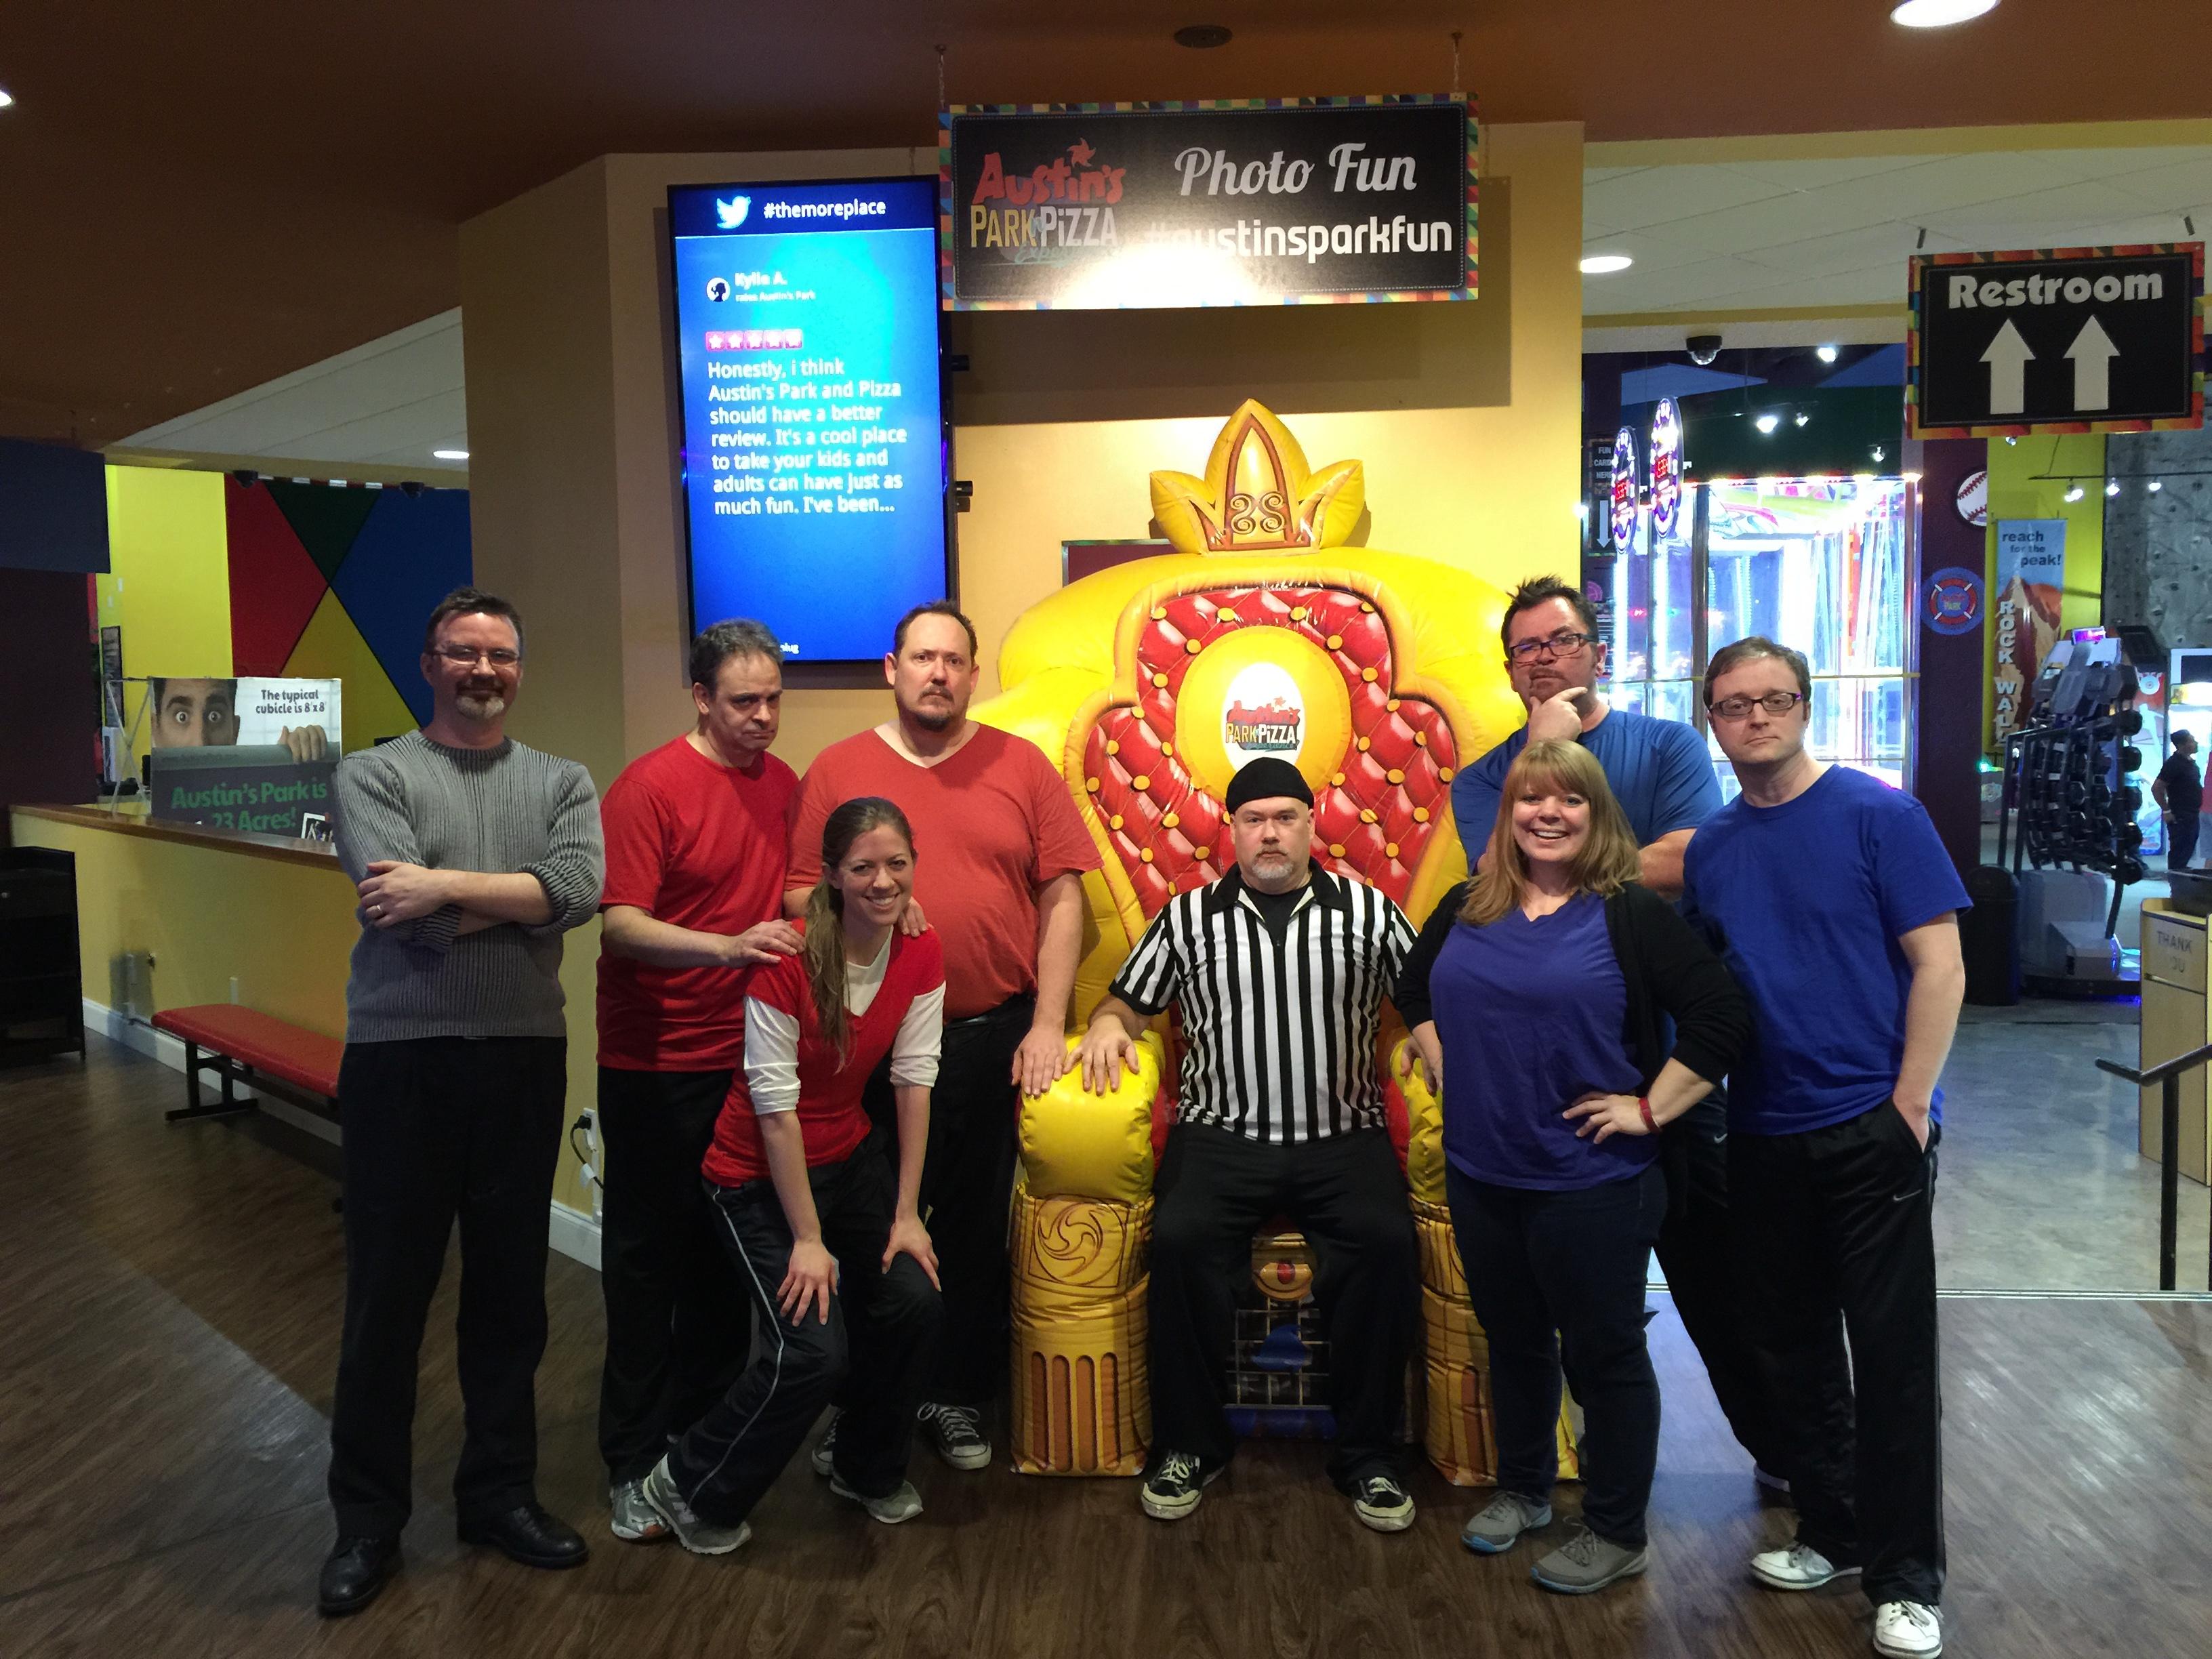 Comedy Spartans Family Improv Show Austin S Park N Pizza